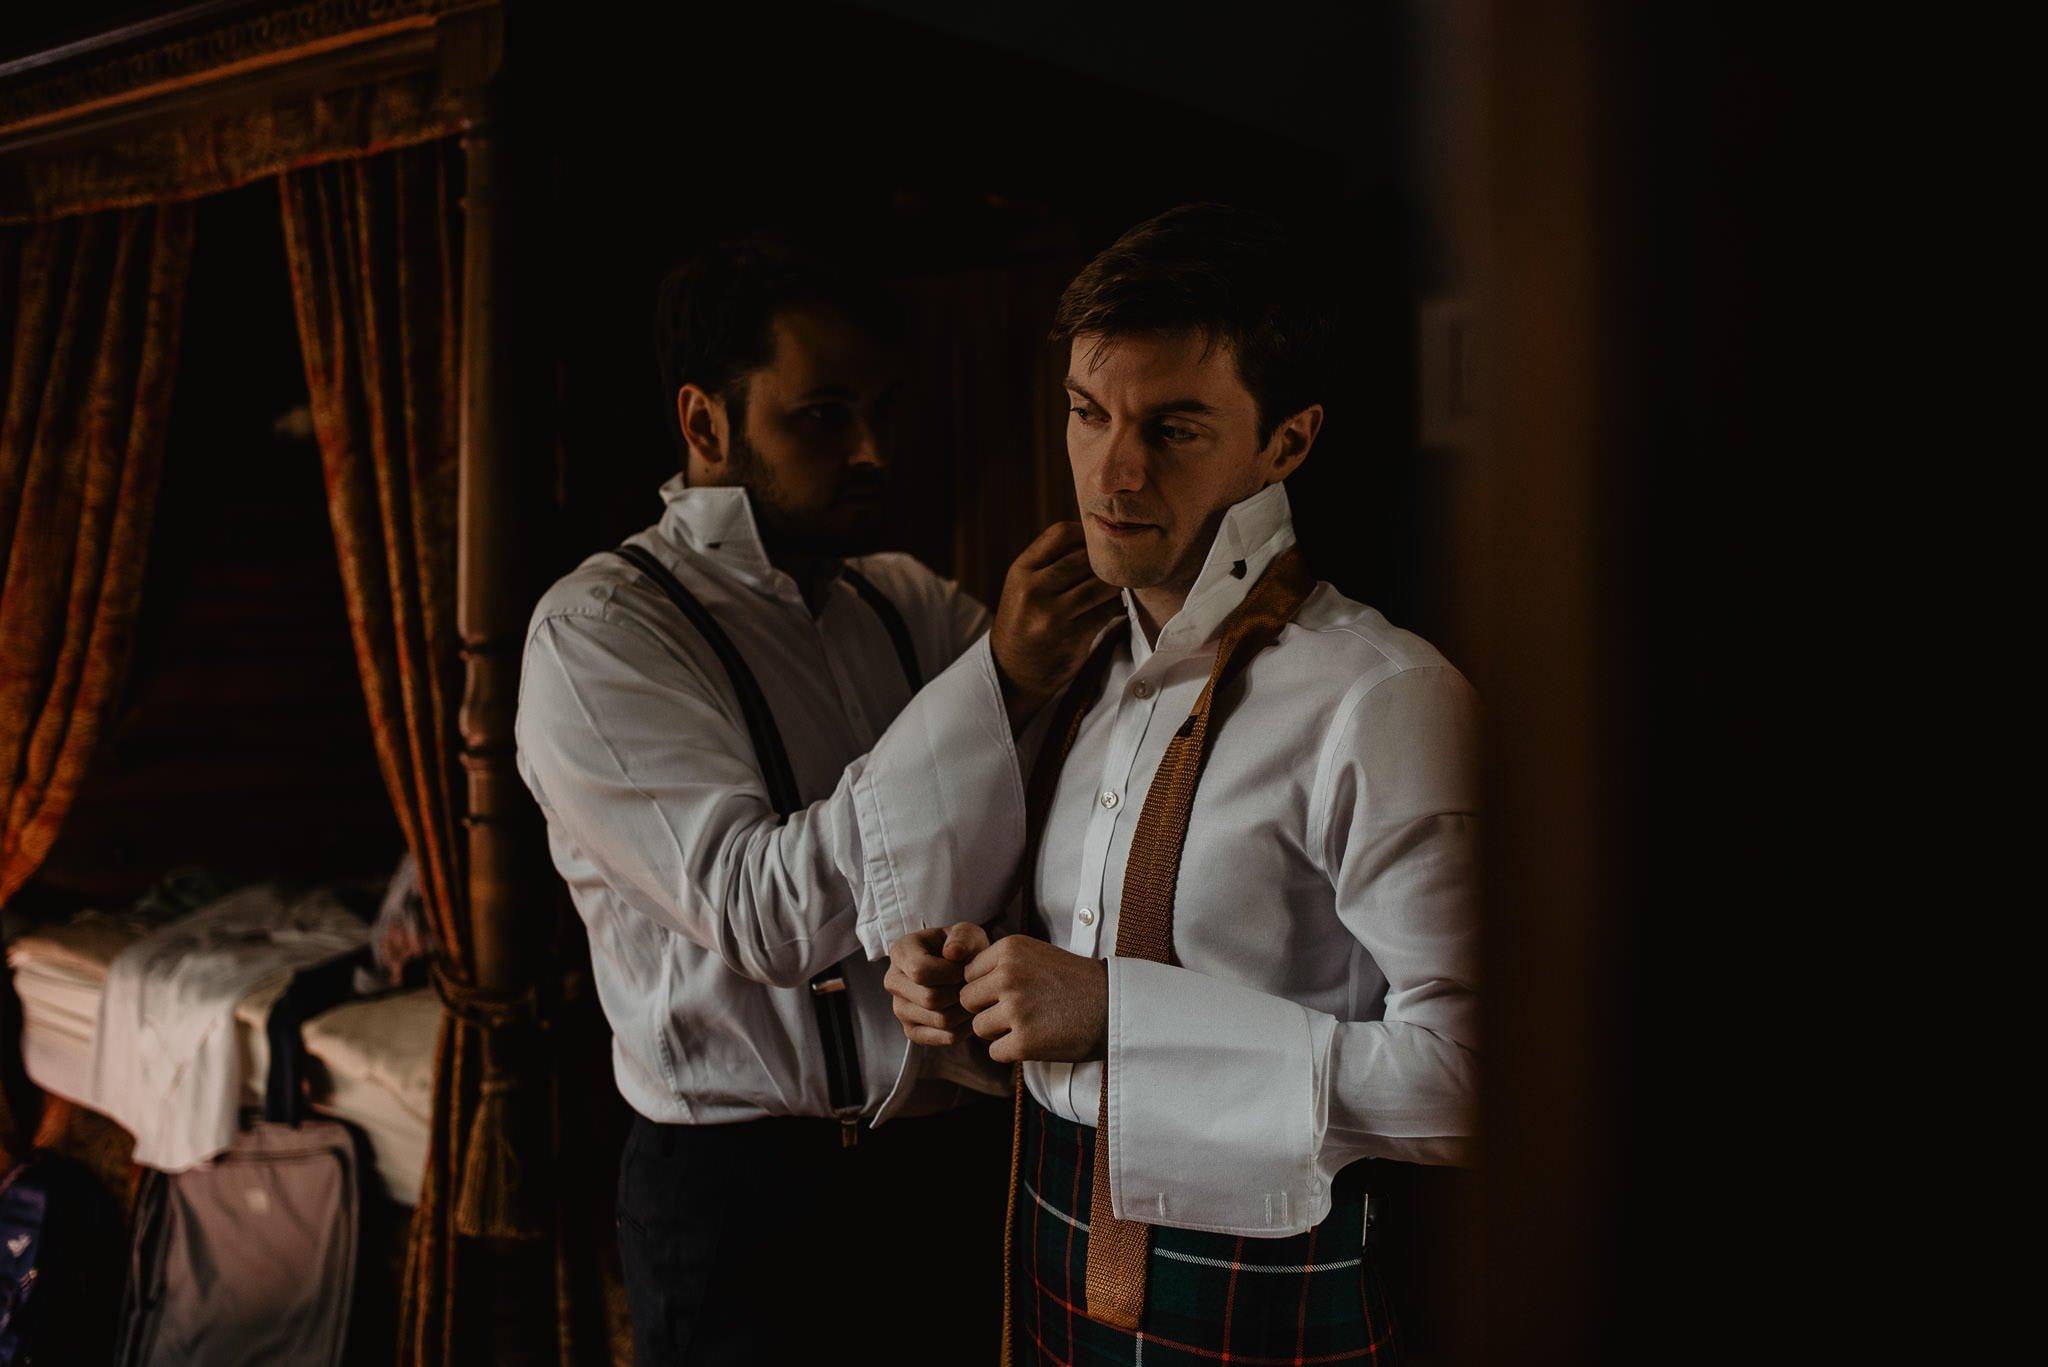 An Italian inspired wedding at Balinakill House 12